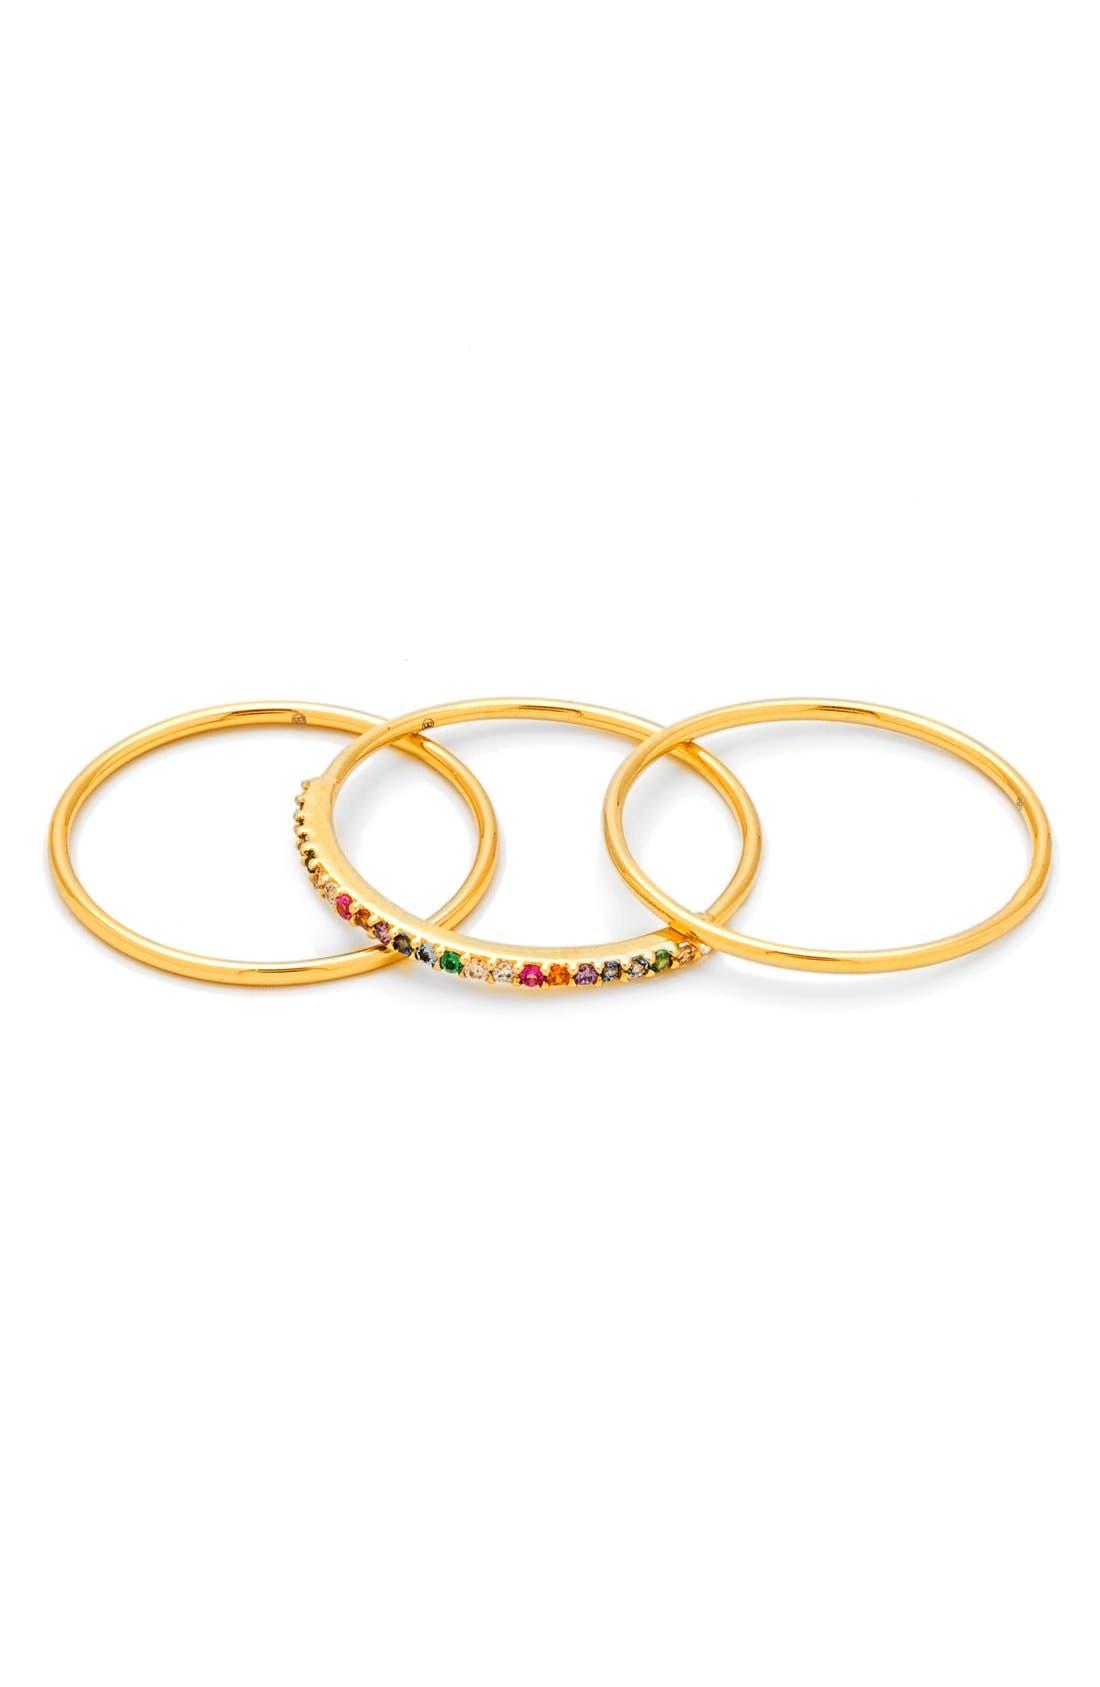 Shimmer Stackable Set of 3 Band Rings,                             Main thumbnail 2, color,